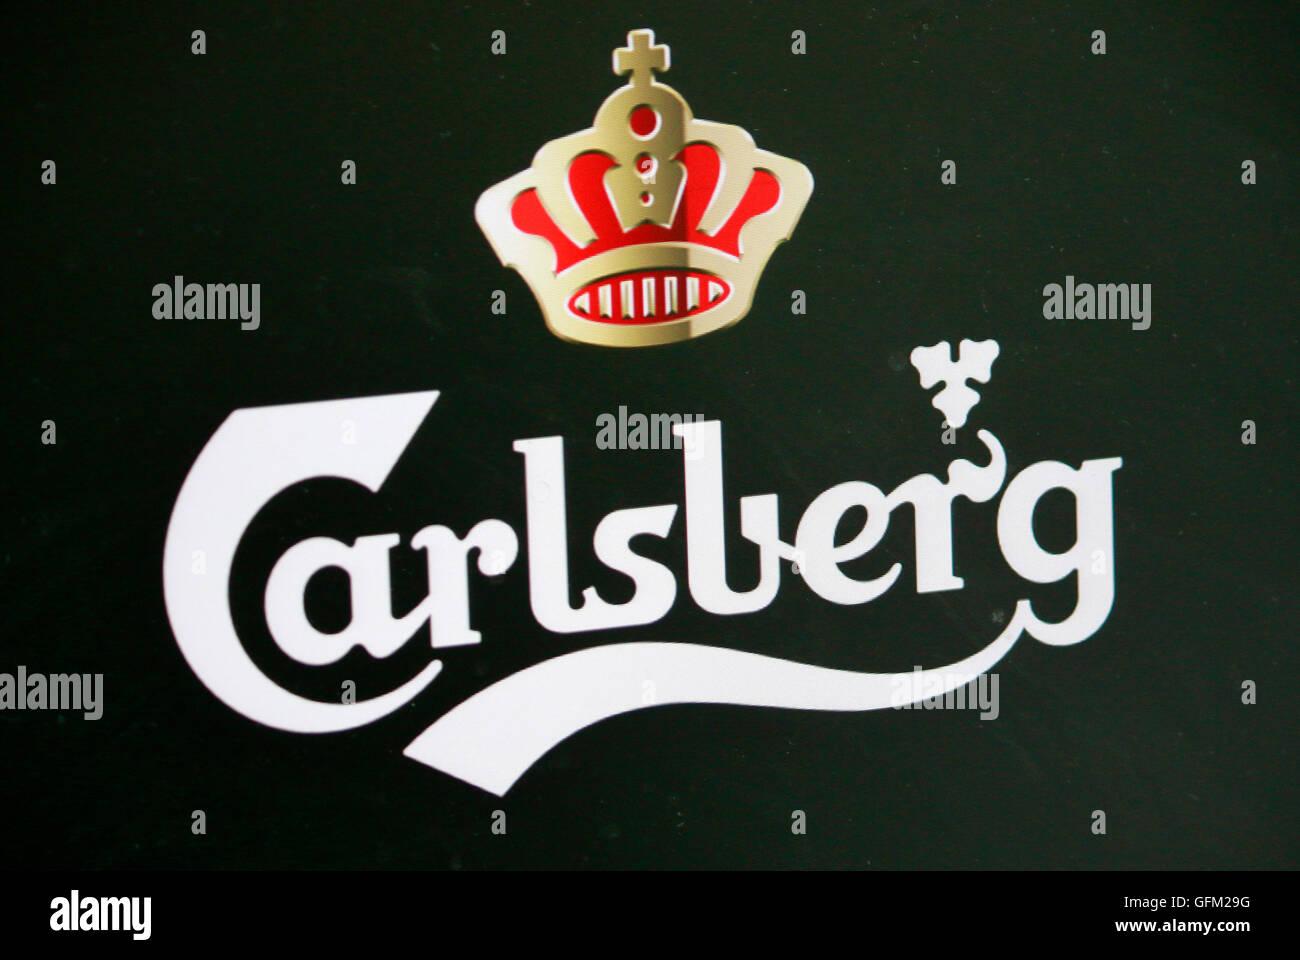 Loge der Marke 'Carlsberg', Berlin. - Stock Image